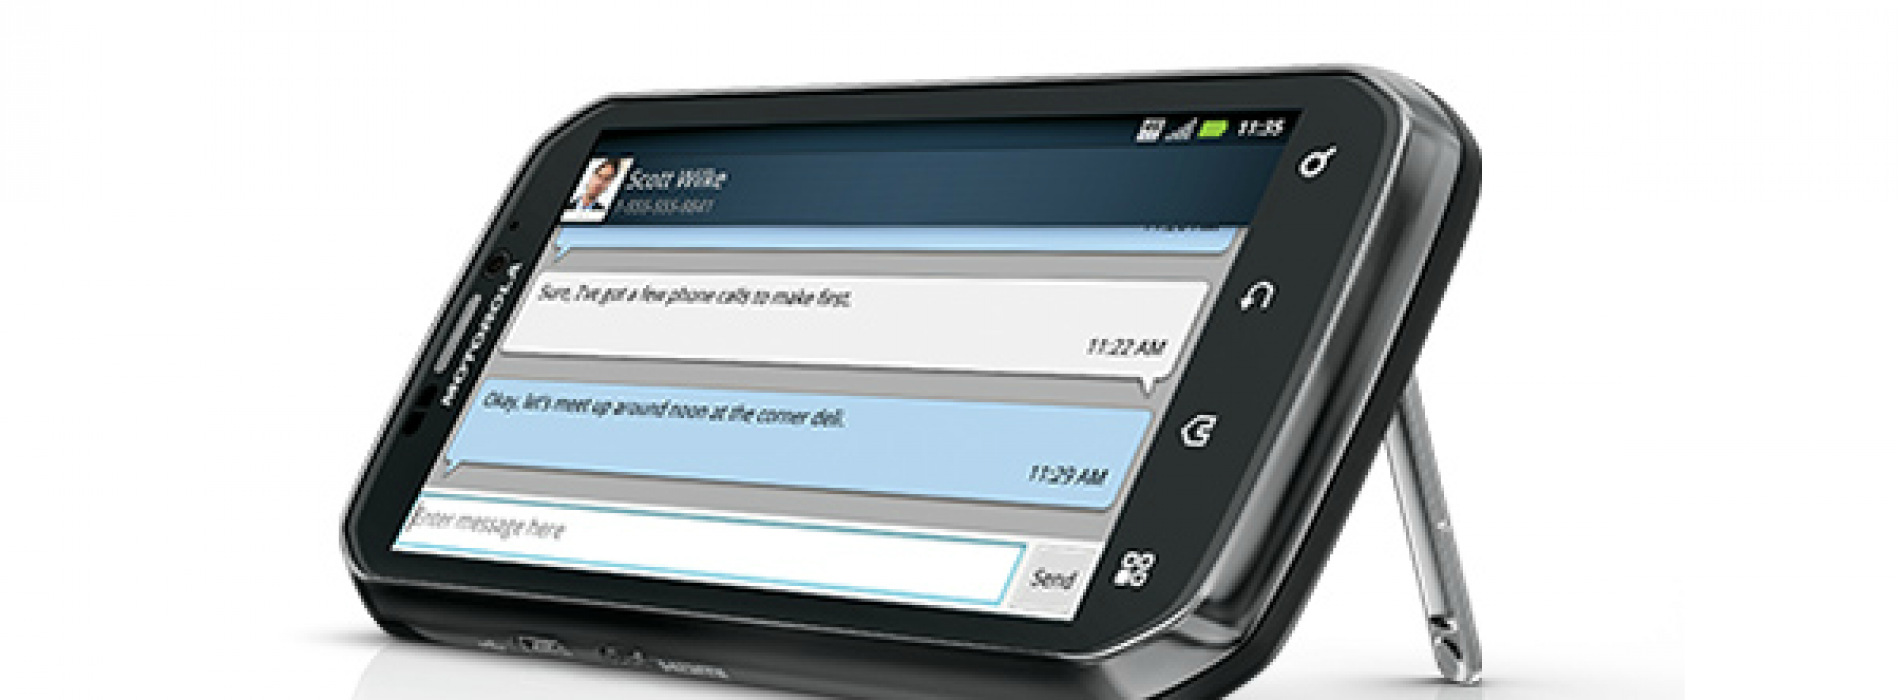 Motorola Photon 4G successor leaked for Sprint